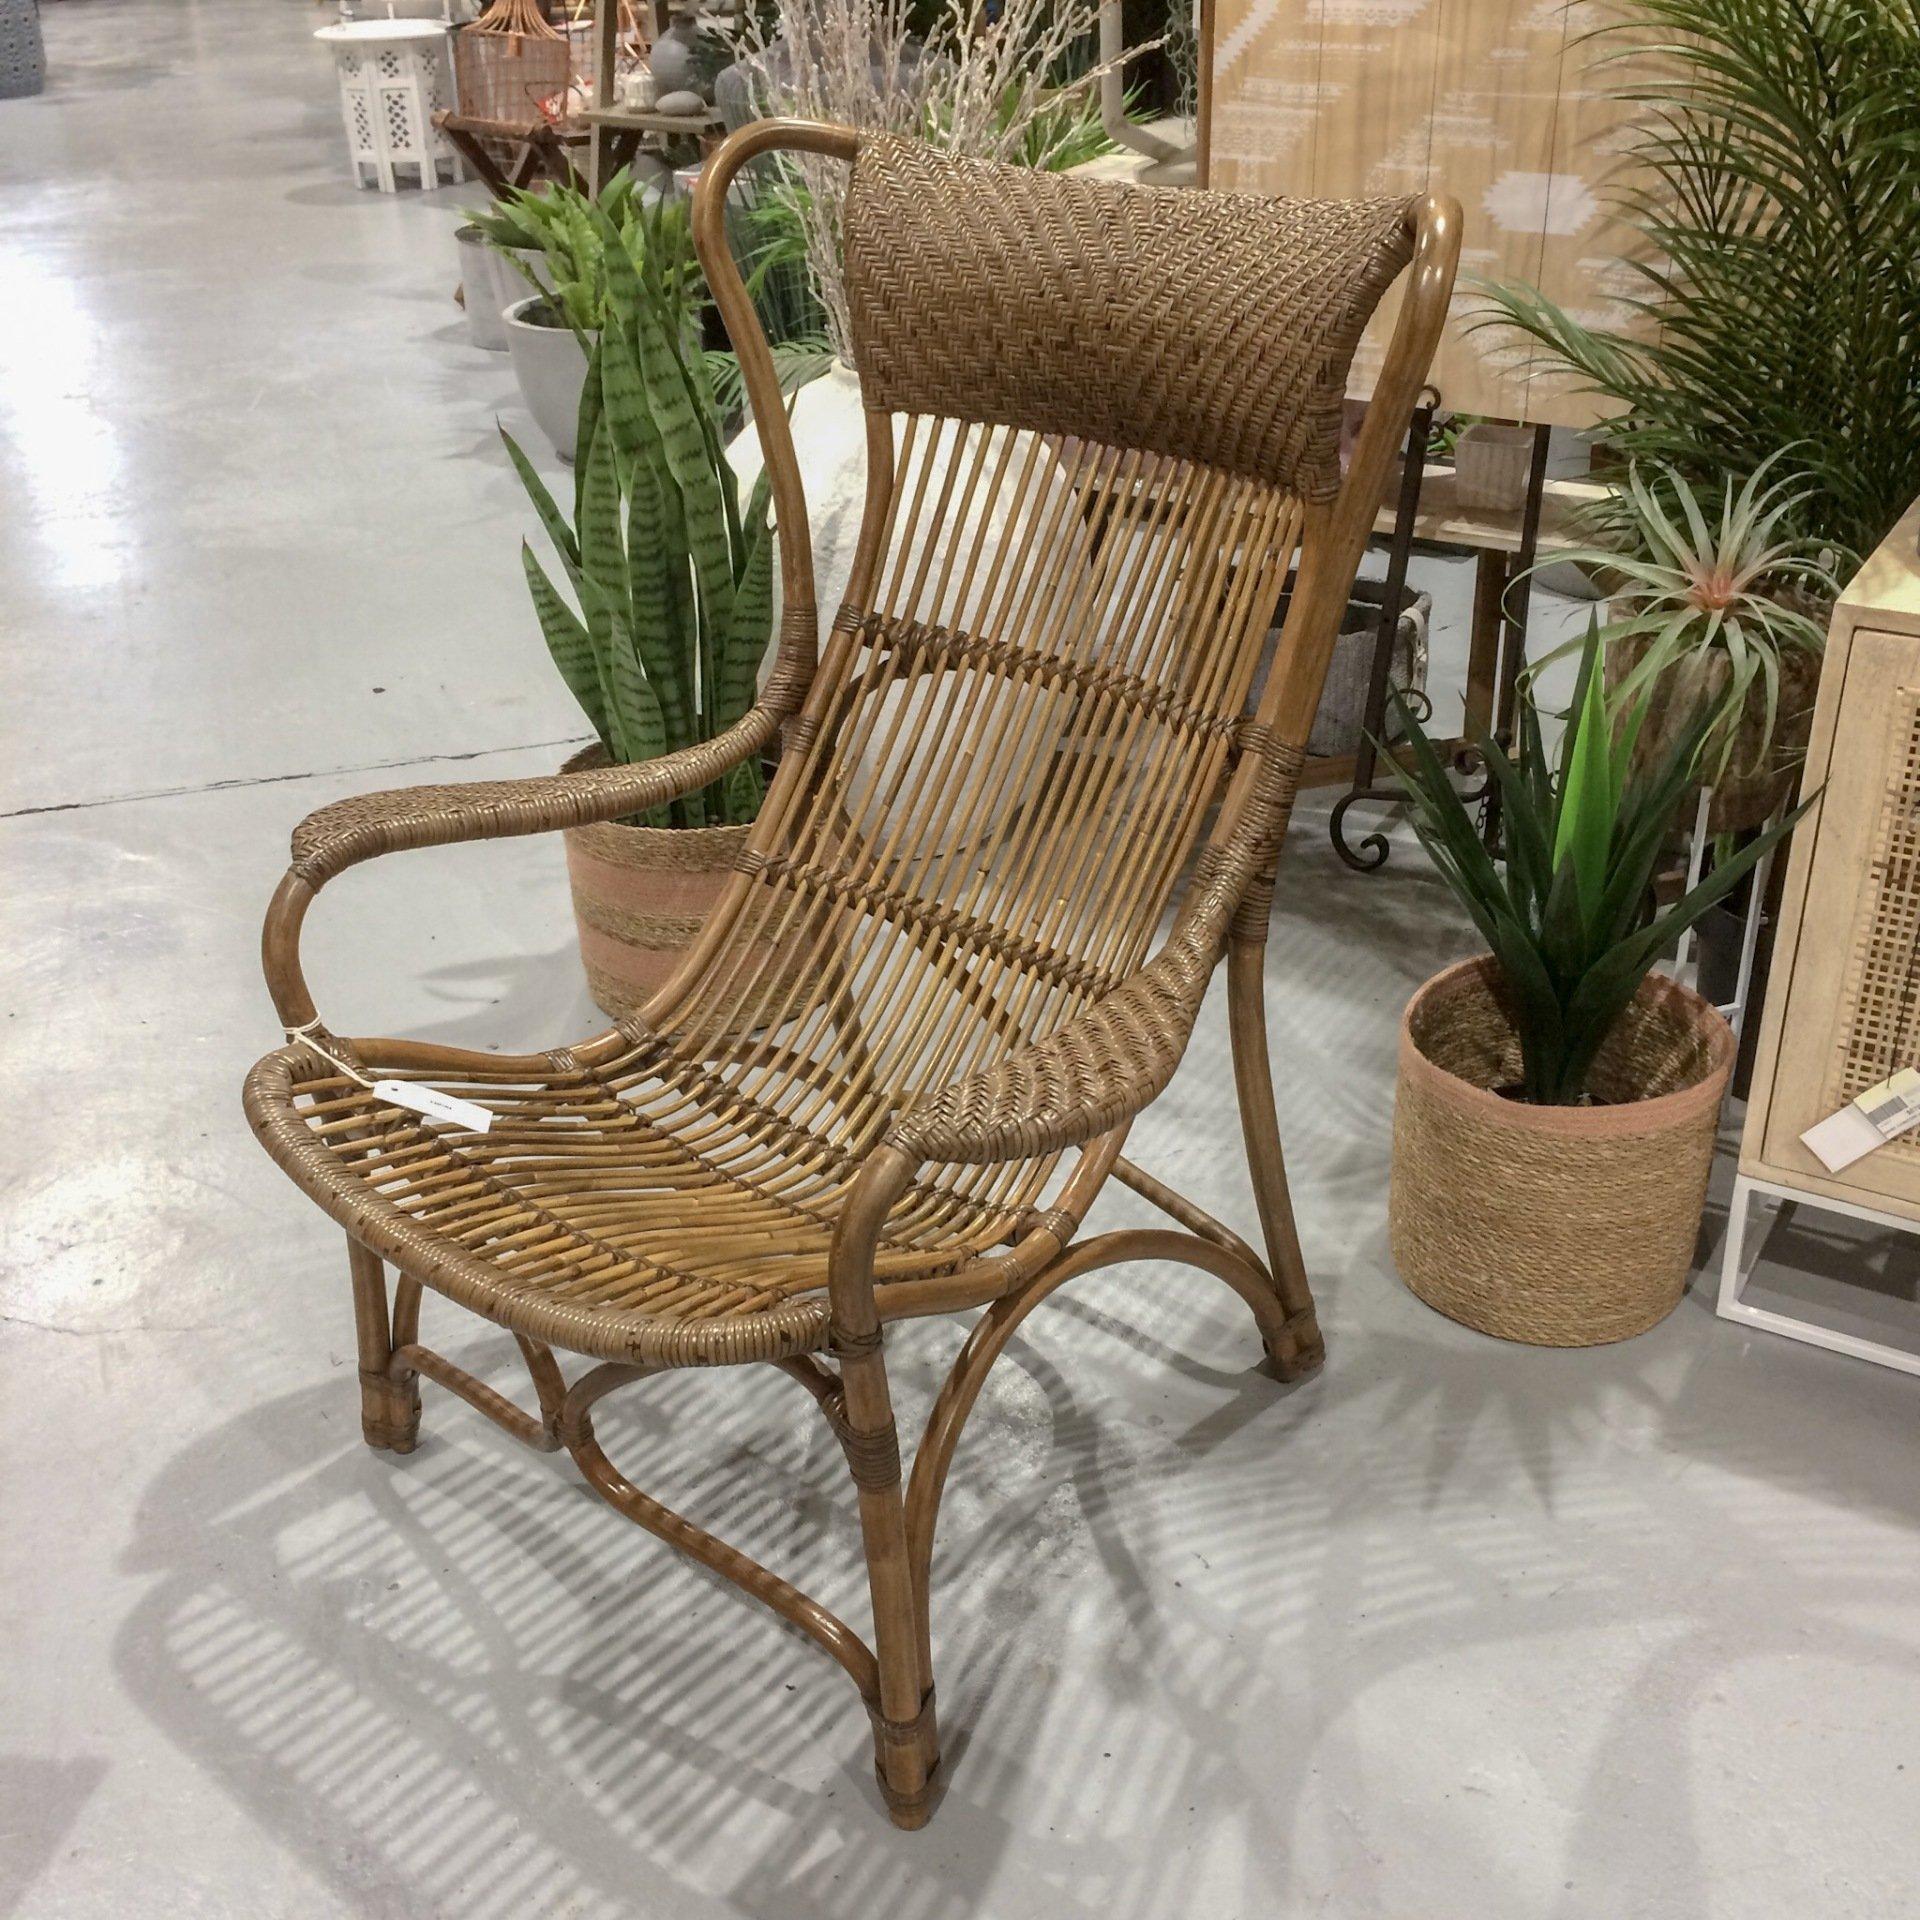 Empire Furniture Newcastle Hamilton Nsw Chairs Stools